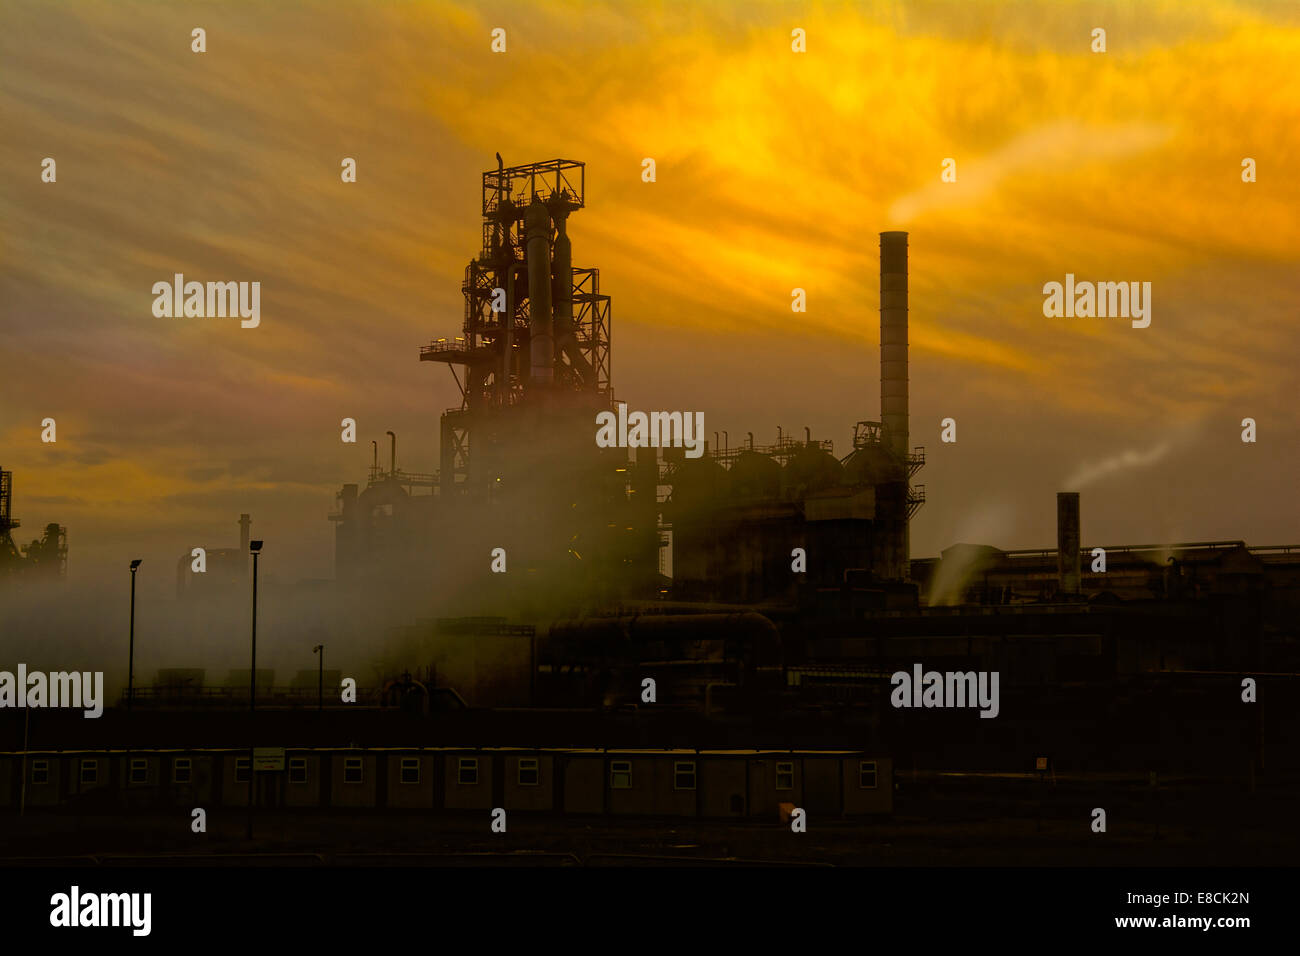 Port Talbot Stahlwerk bei Sonnenuntergang. Industrielandschaft. Stockfoto